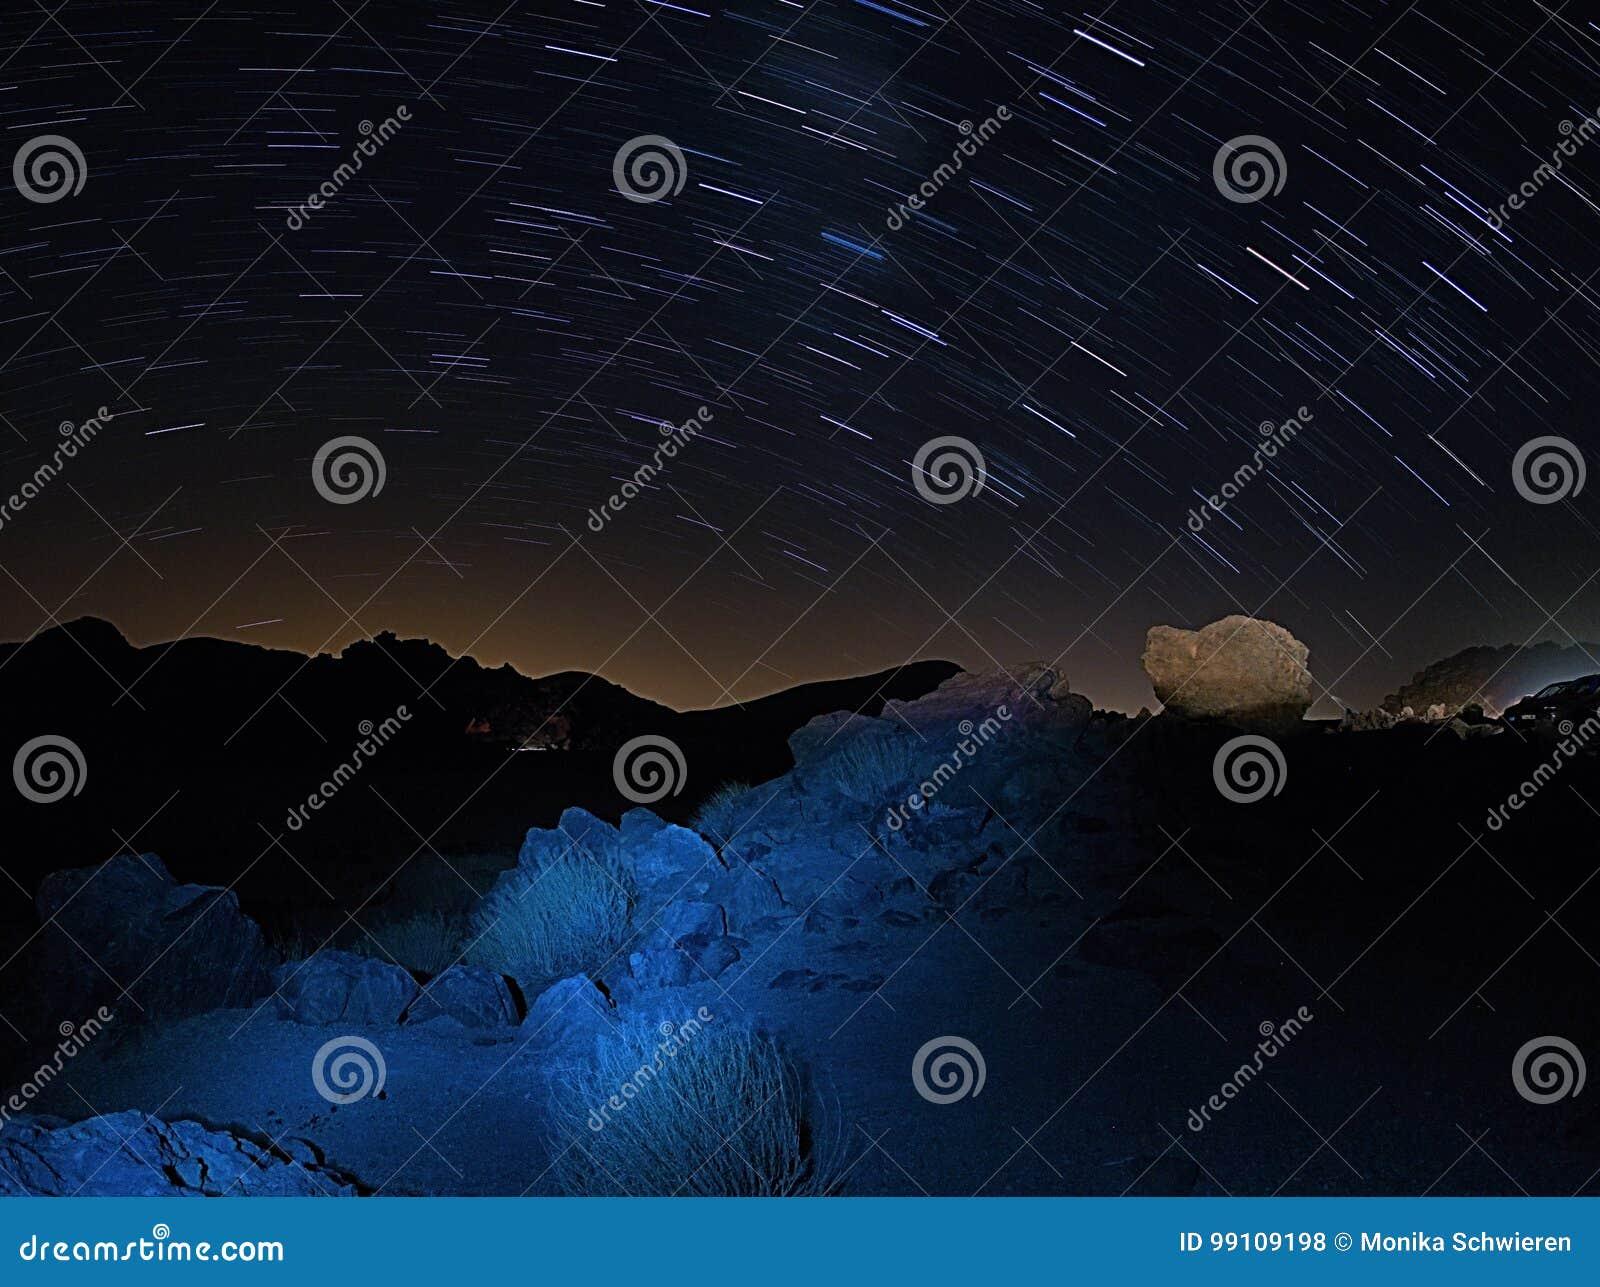 Sternspuren im Nationalpark Teide Teneriffa